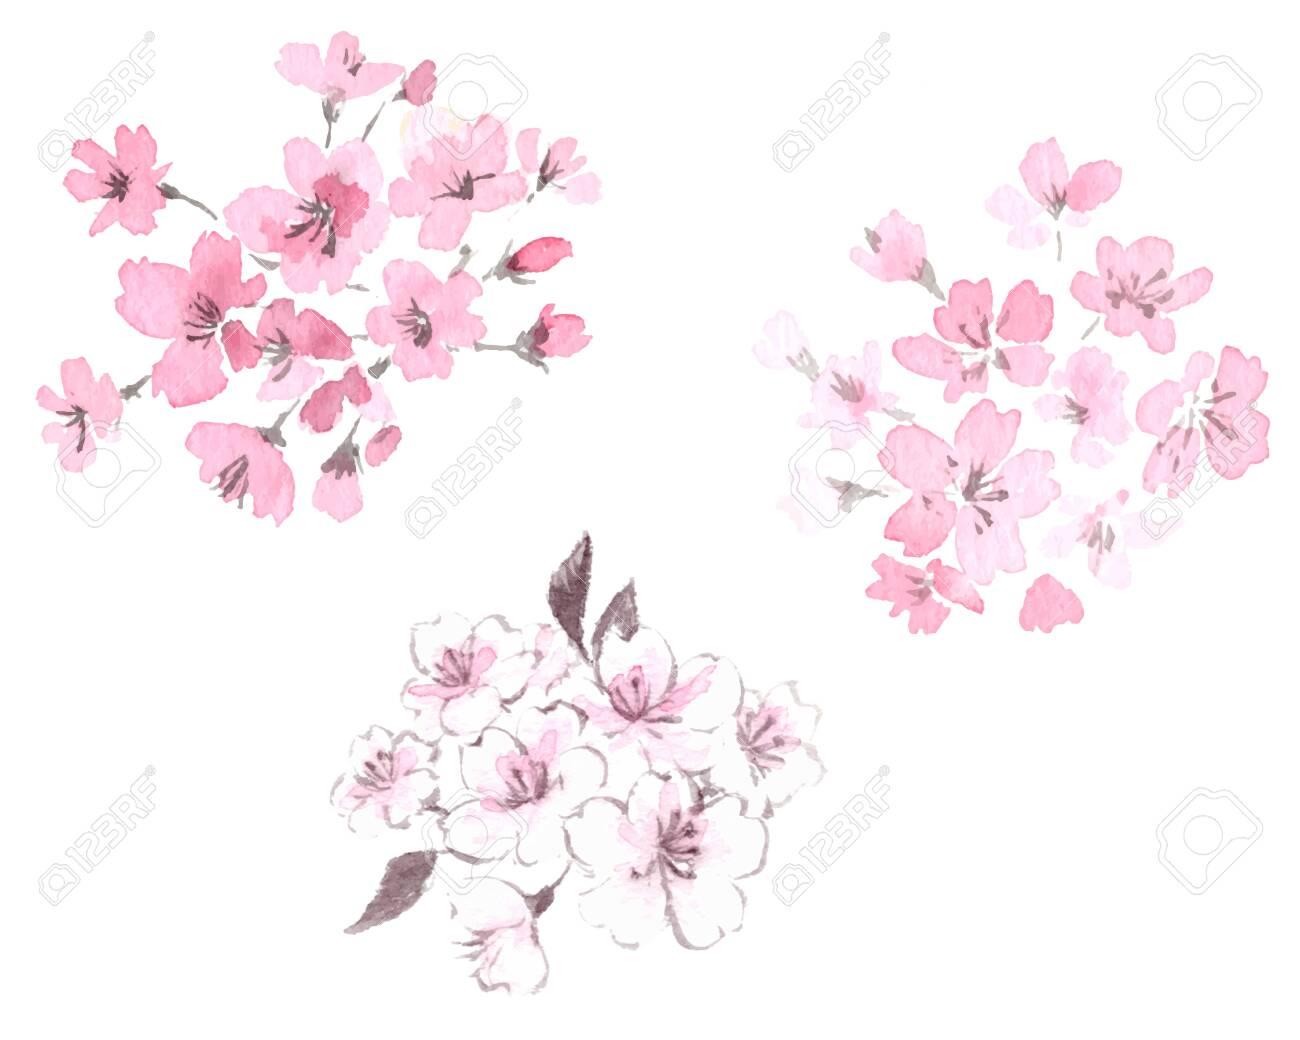 Cherry blossom illustration set - 124531766